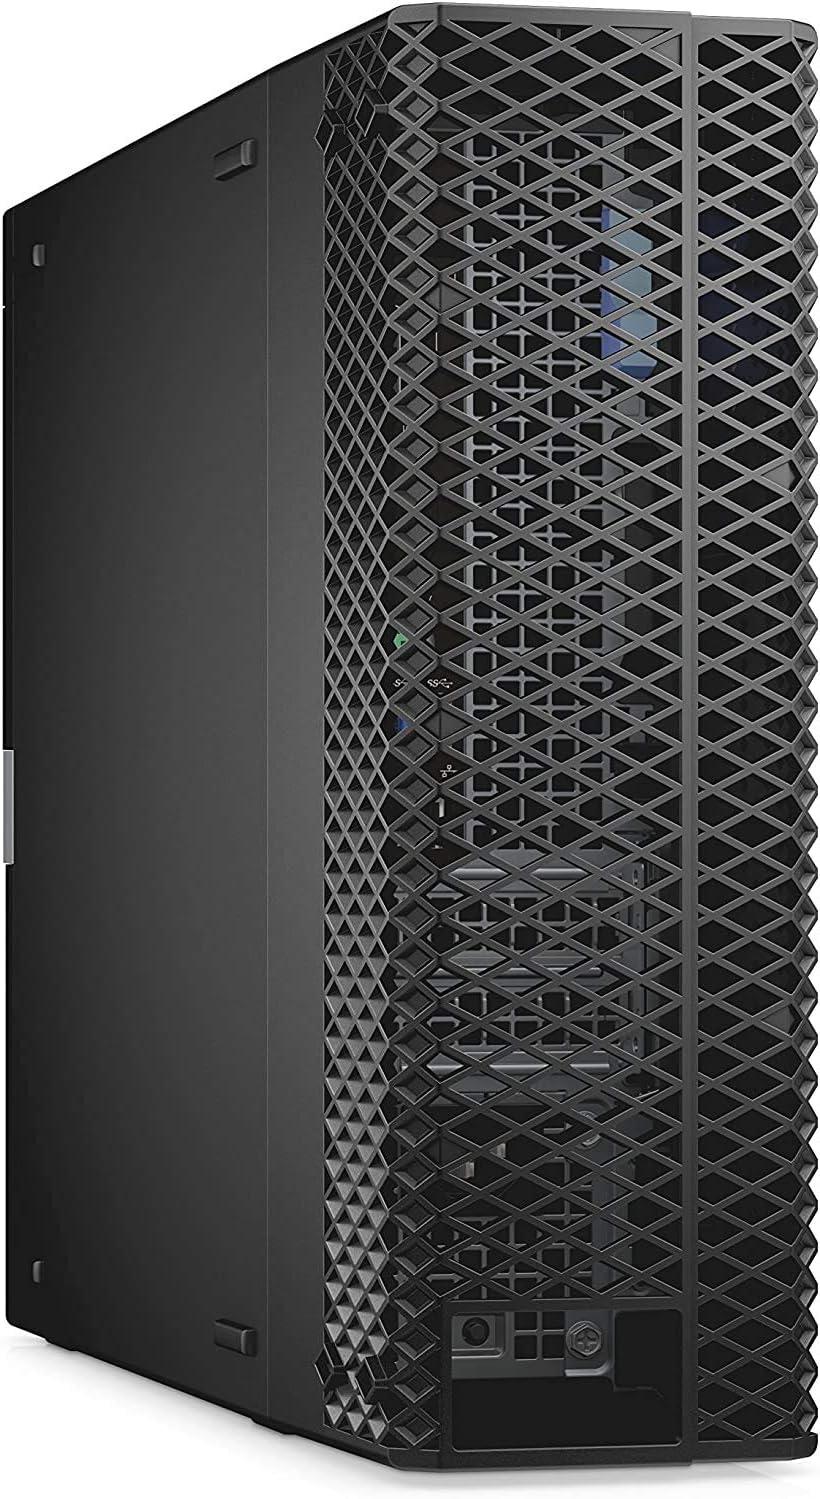 Dell OptiPlex 7070 Small Form Factor | Intel 9th Gen i7-9700 (8 Core, 3GHz) | 16GB DDR4 | 256GB Solid State Drive | Win 10 Pro (Renewed)